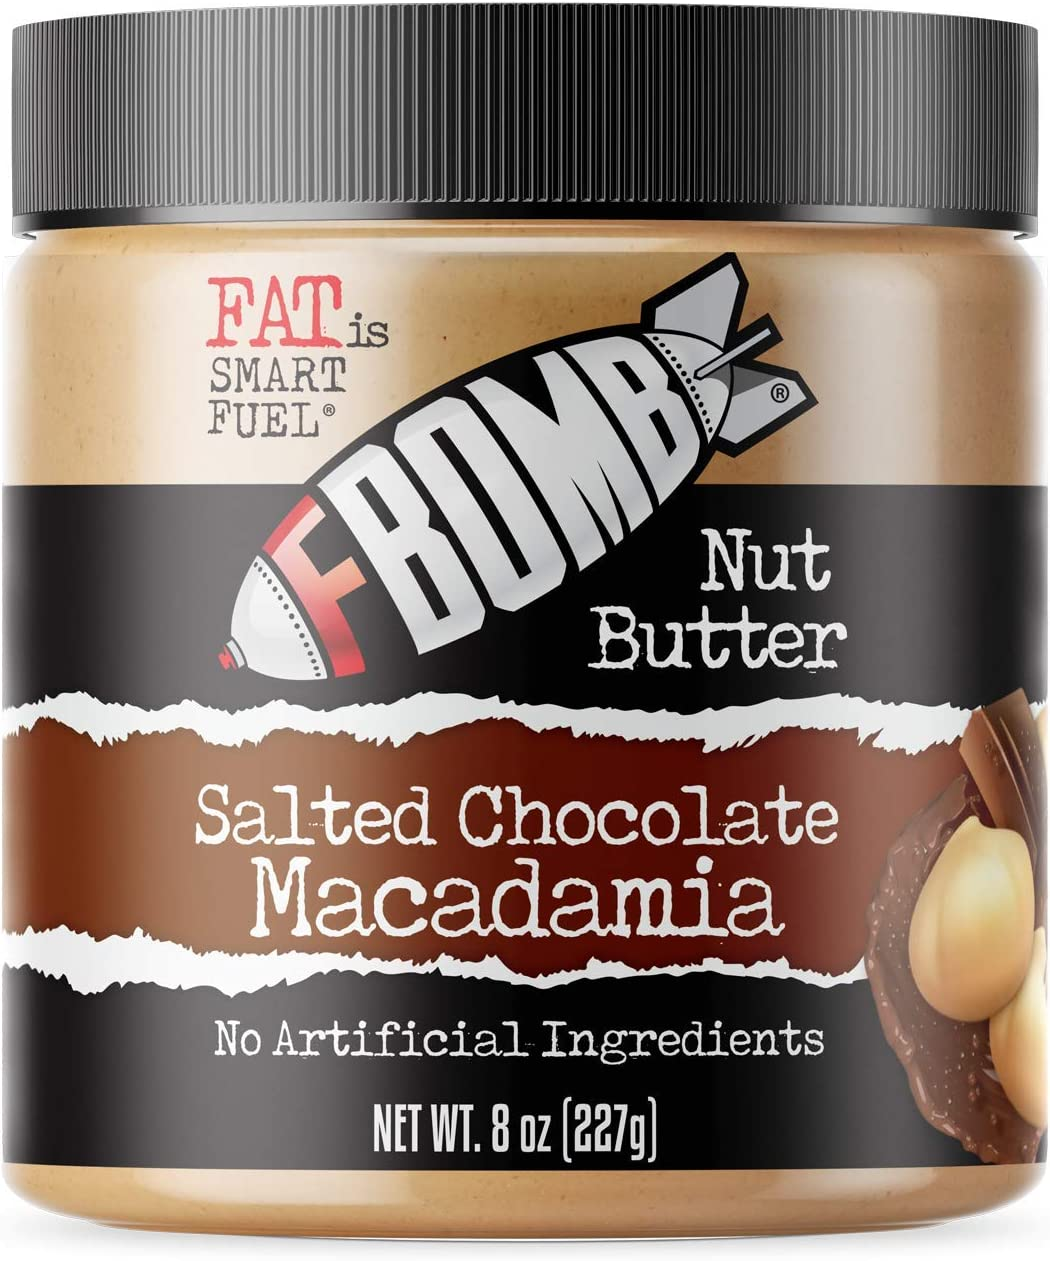 FBOMB Macadamia Nut Butter: Keto Fat Bombs, Natural Roasted Macadamia Nuts   High Fat, Low Carb Snack, Energy   Paleo, Healthy, Keto Snacks   Salted Chocolate Macadamia - 8oz Jar